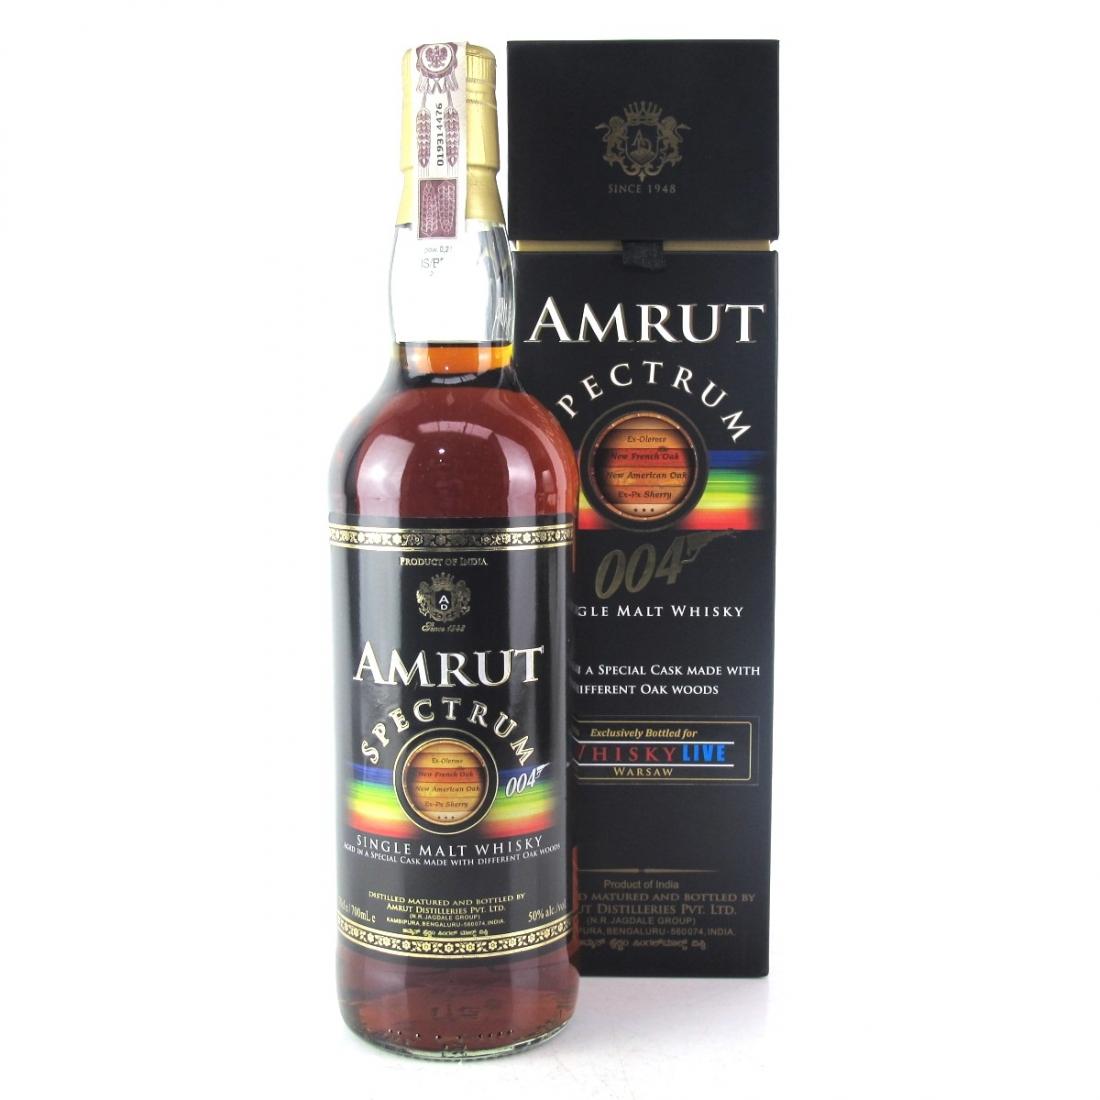 Amrut Spectrum 004 / Whisky Live Warsaw